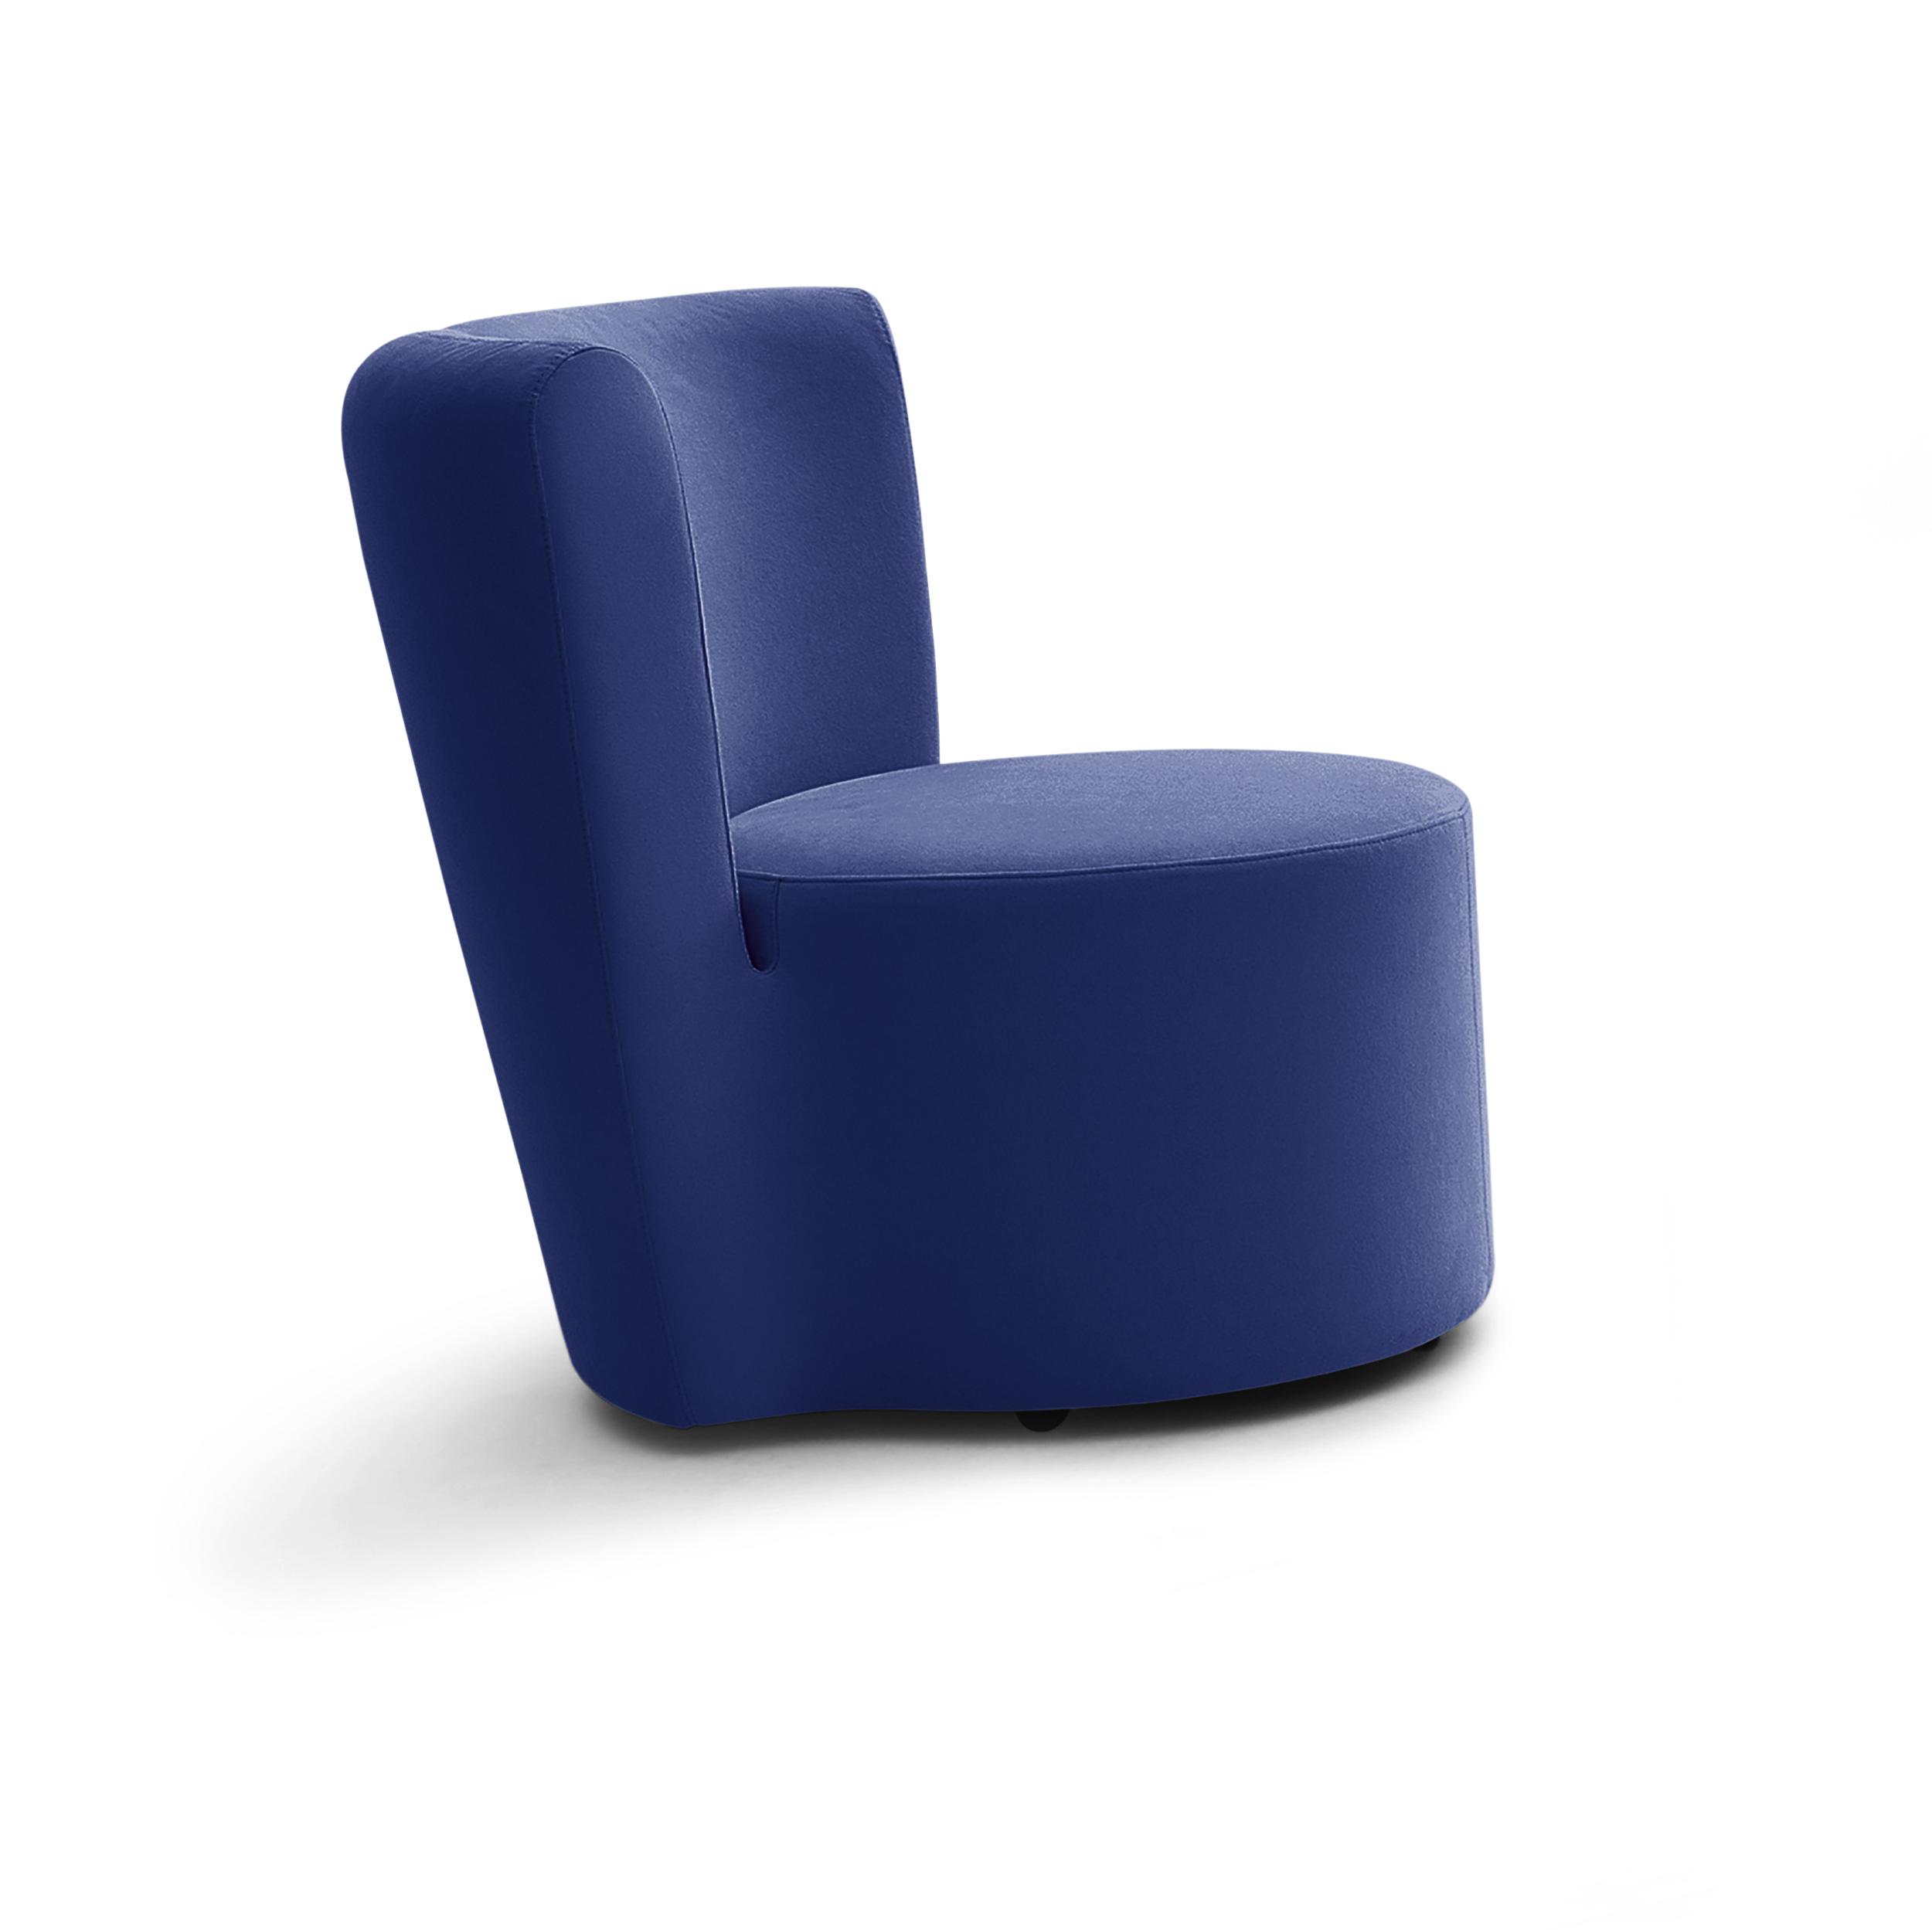 ovo sessel professional cor. Black Bedroom Furniture Sets. Home Design Ideas